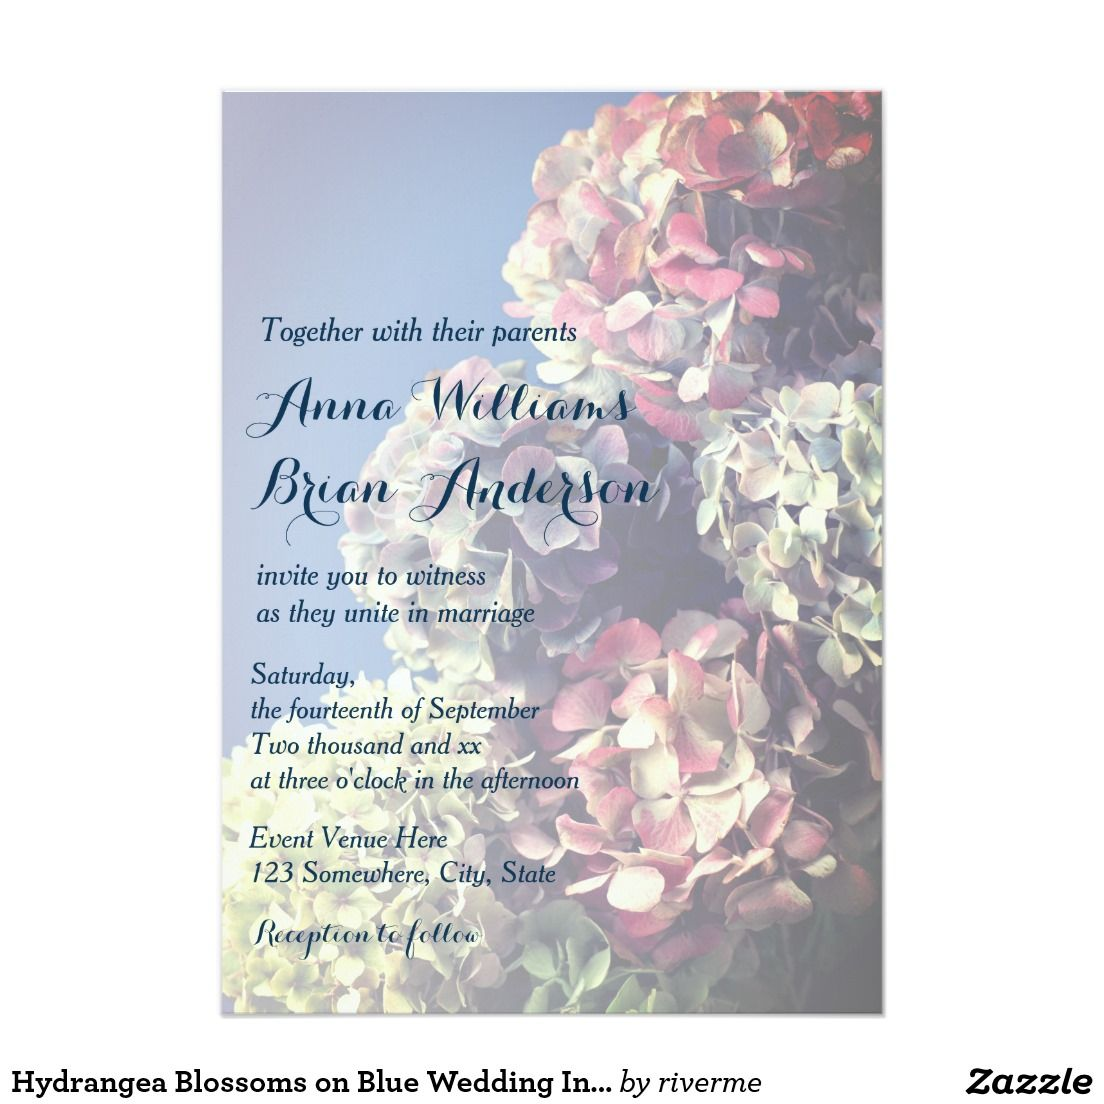 Hydrangea Blossoms on Blue Wedding Invitation